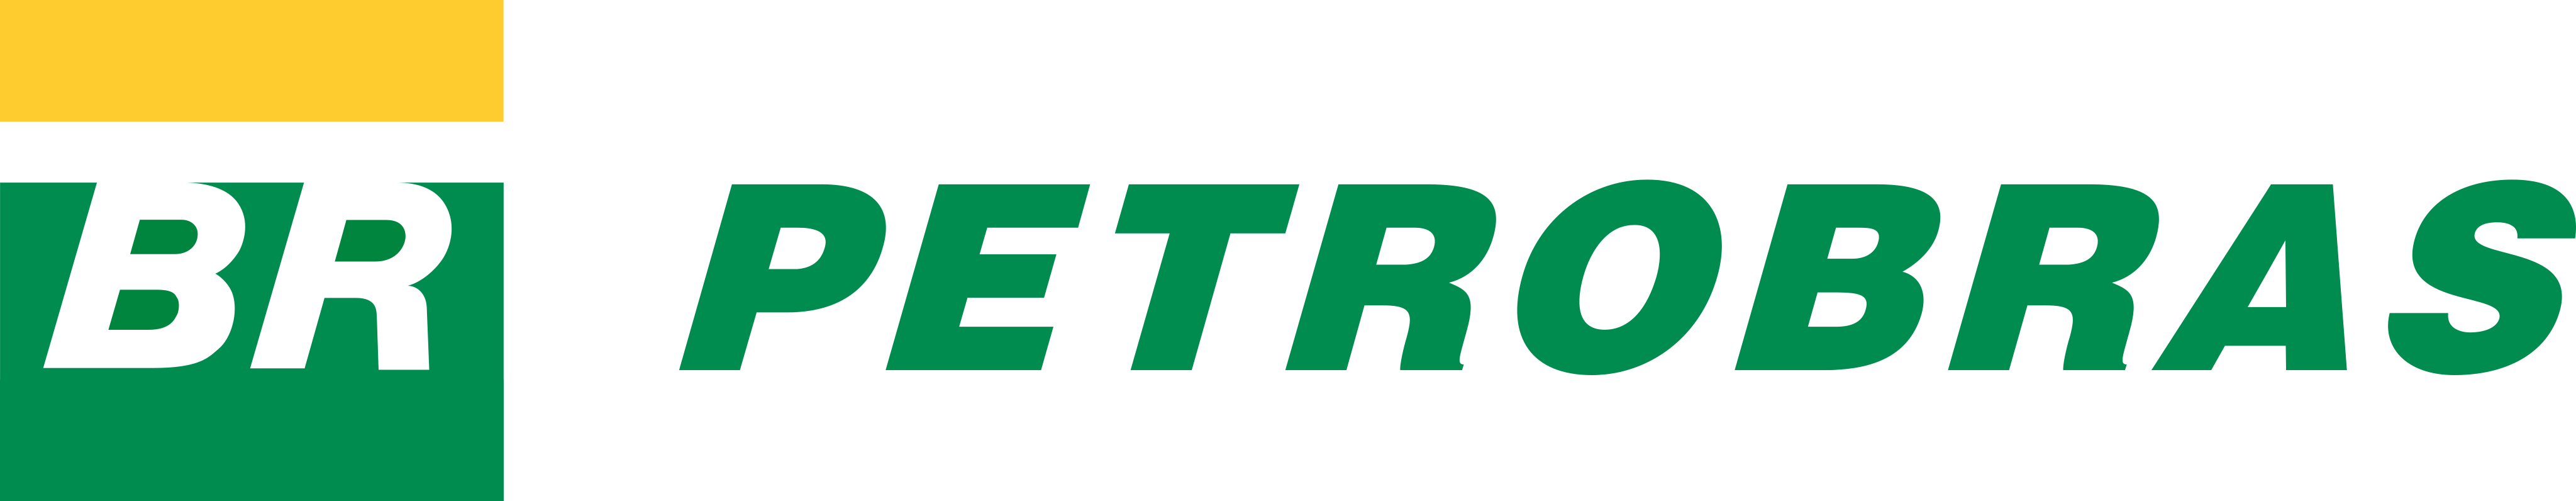 Petrobras - Resgate Vertical